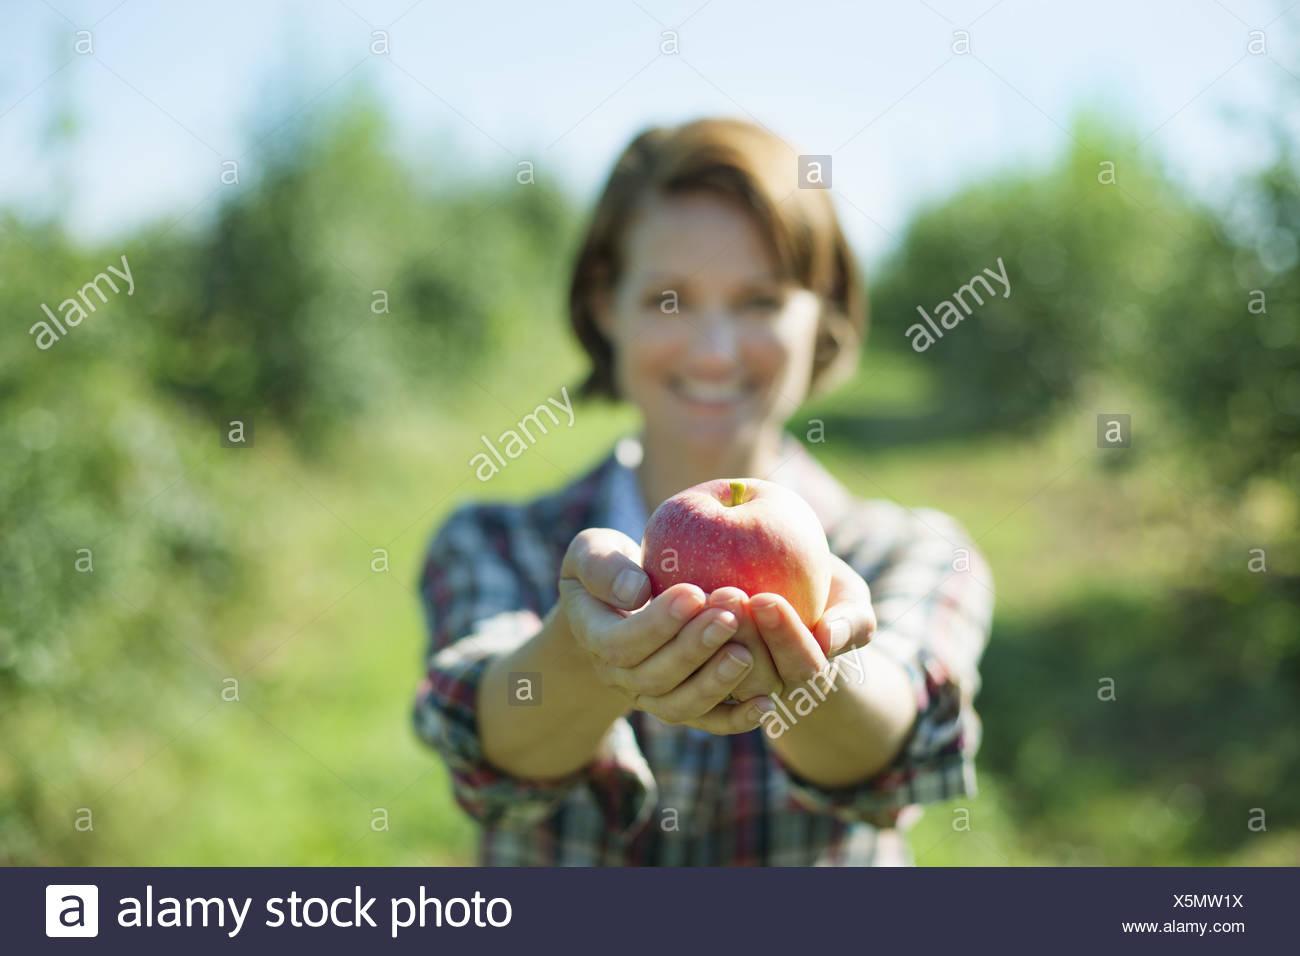 Woodstock, New York USA Frau im karierten Hemd hält Apfel schalenförmige Hände Stockbild